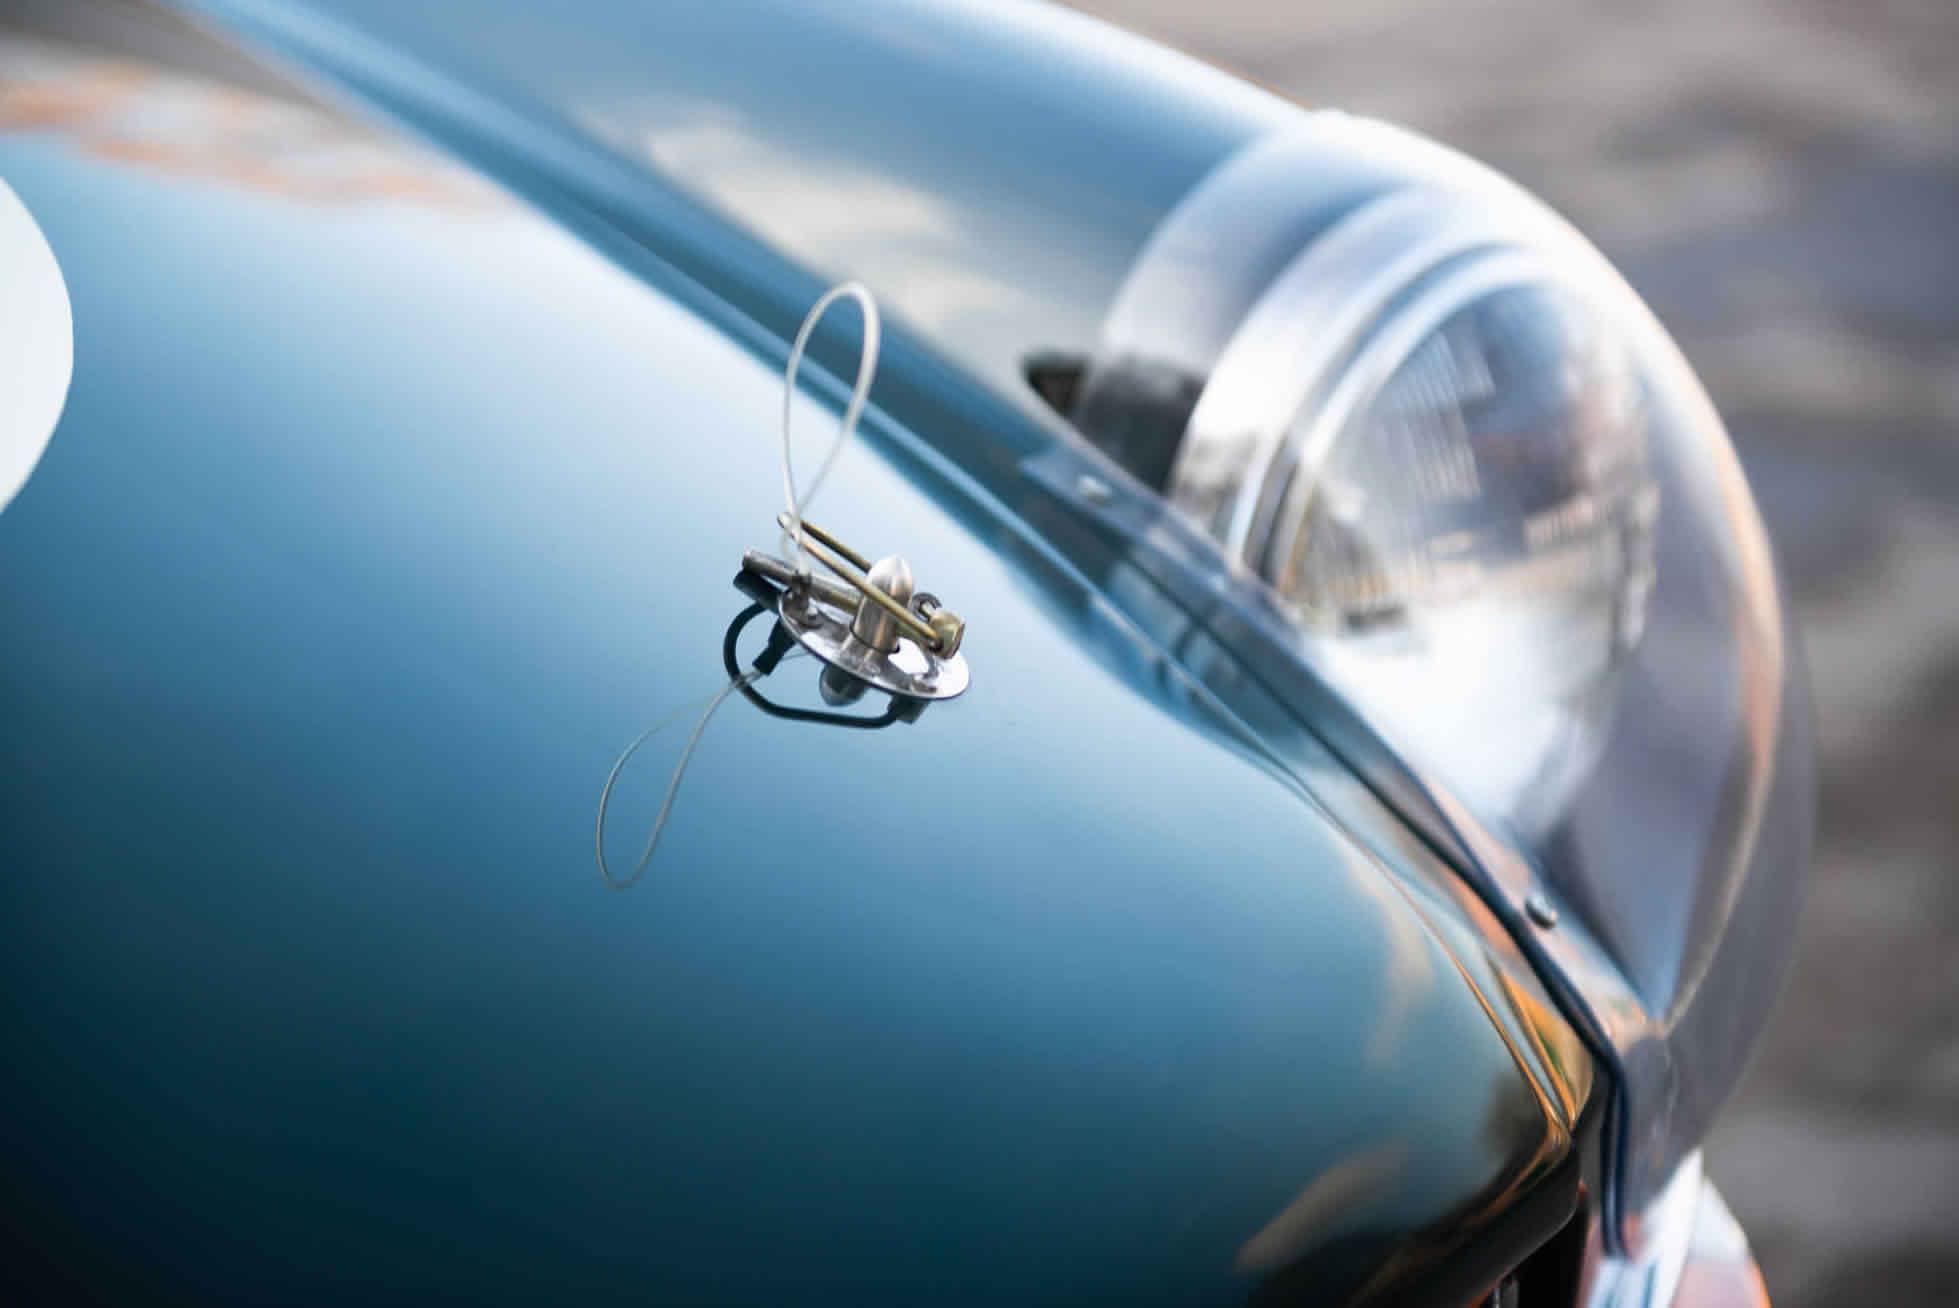 For Sale 1964 MGB Roadster FIA Race Car light